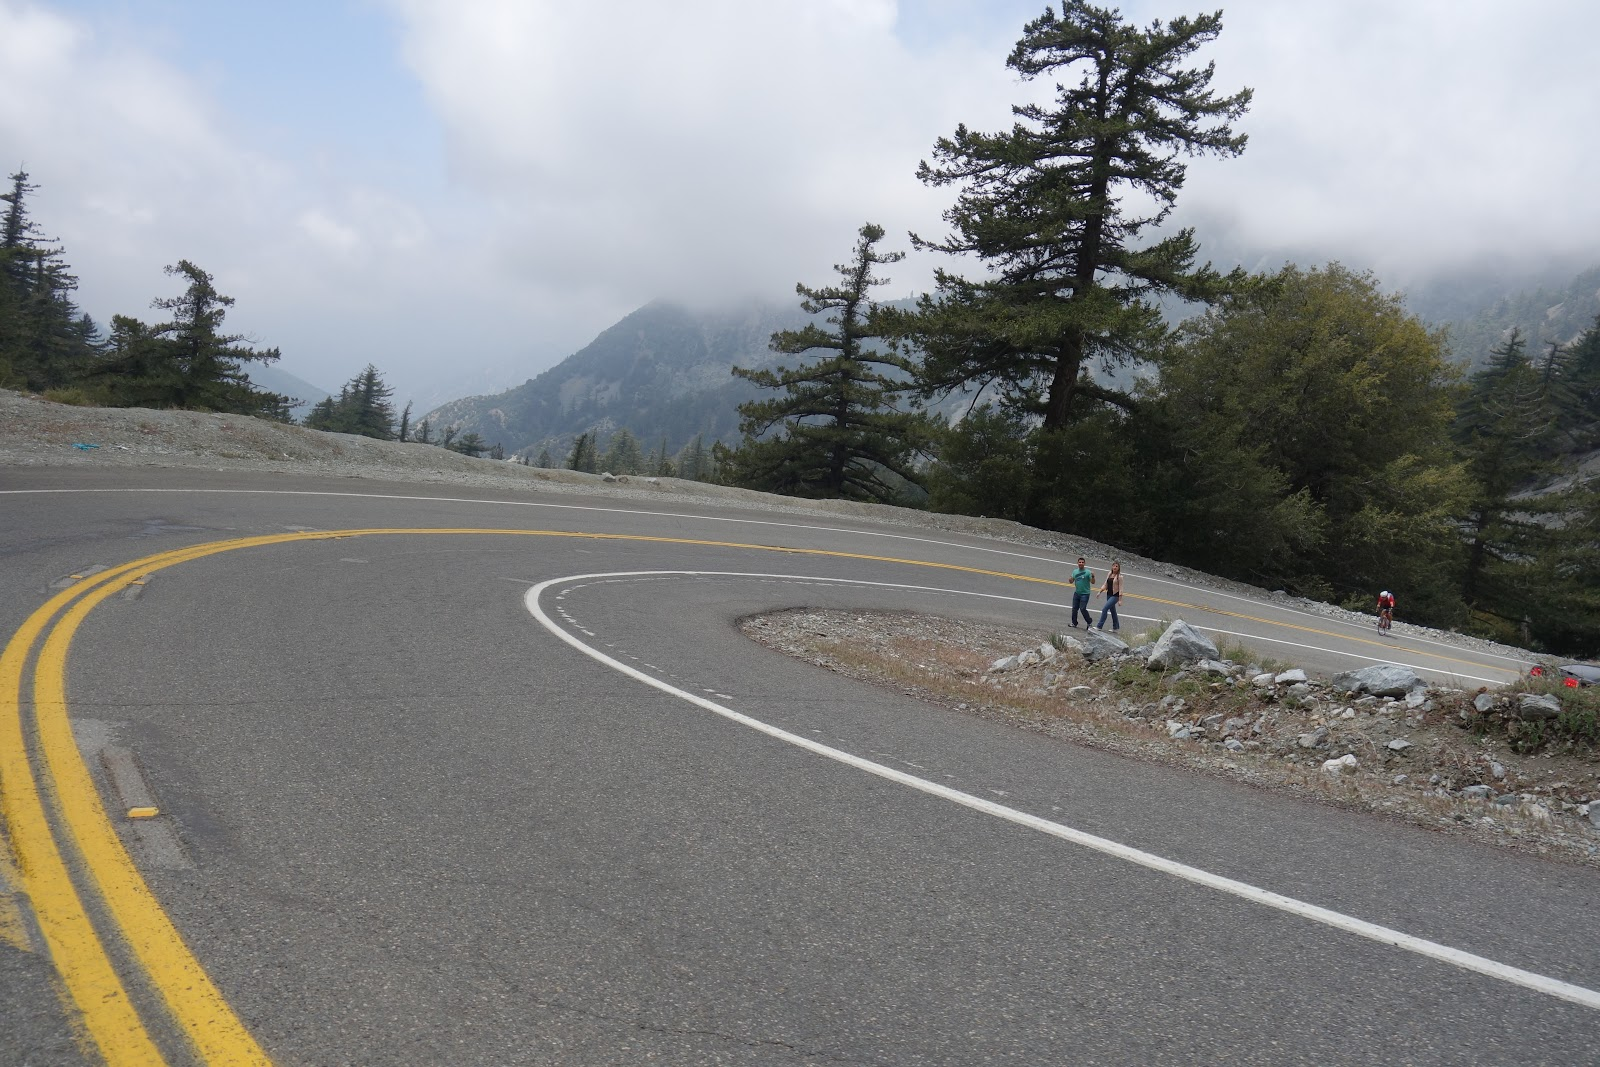 Hairpins on Glendora Mountain road